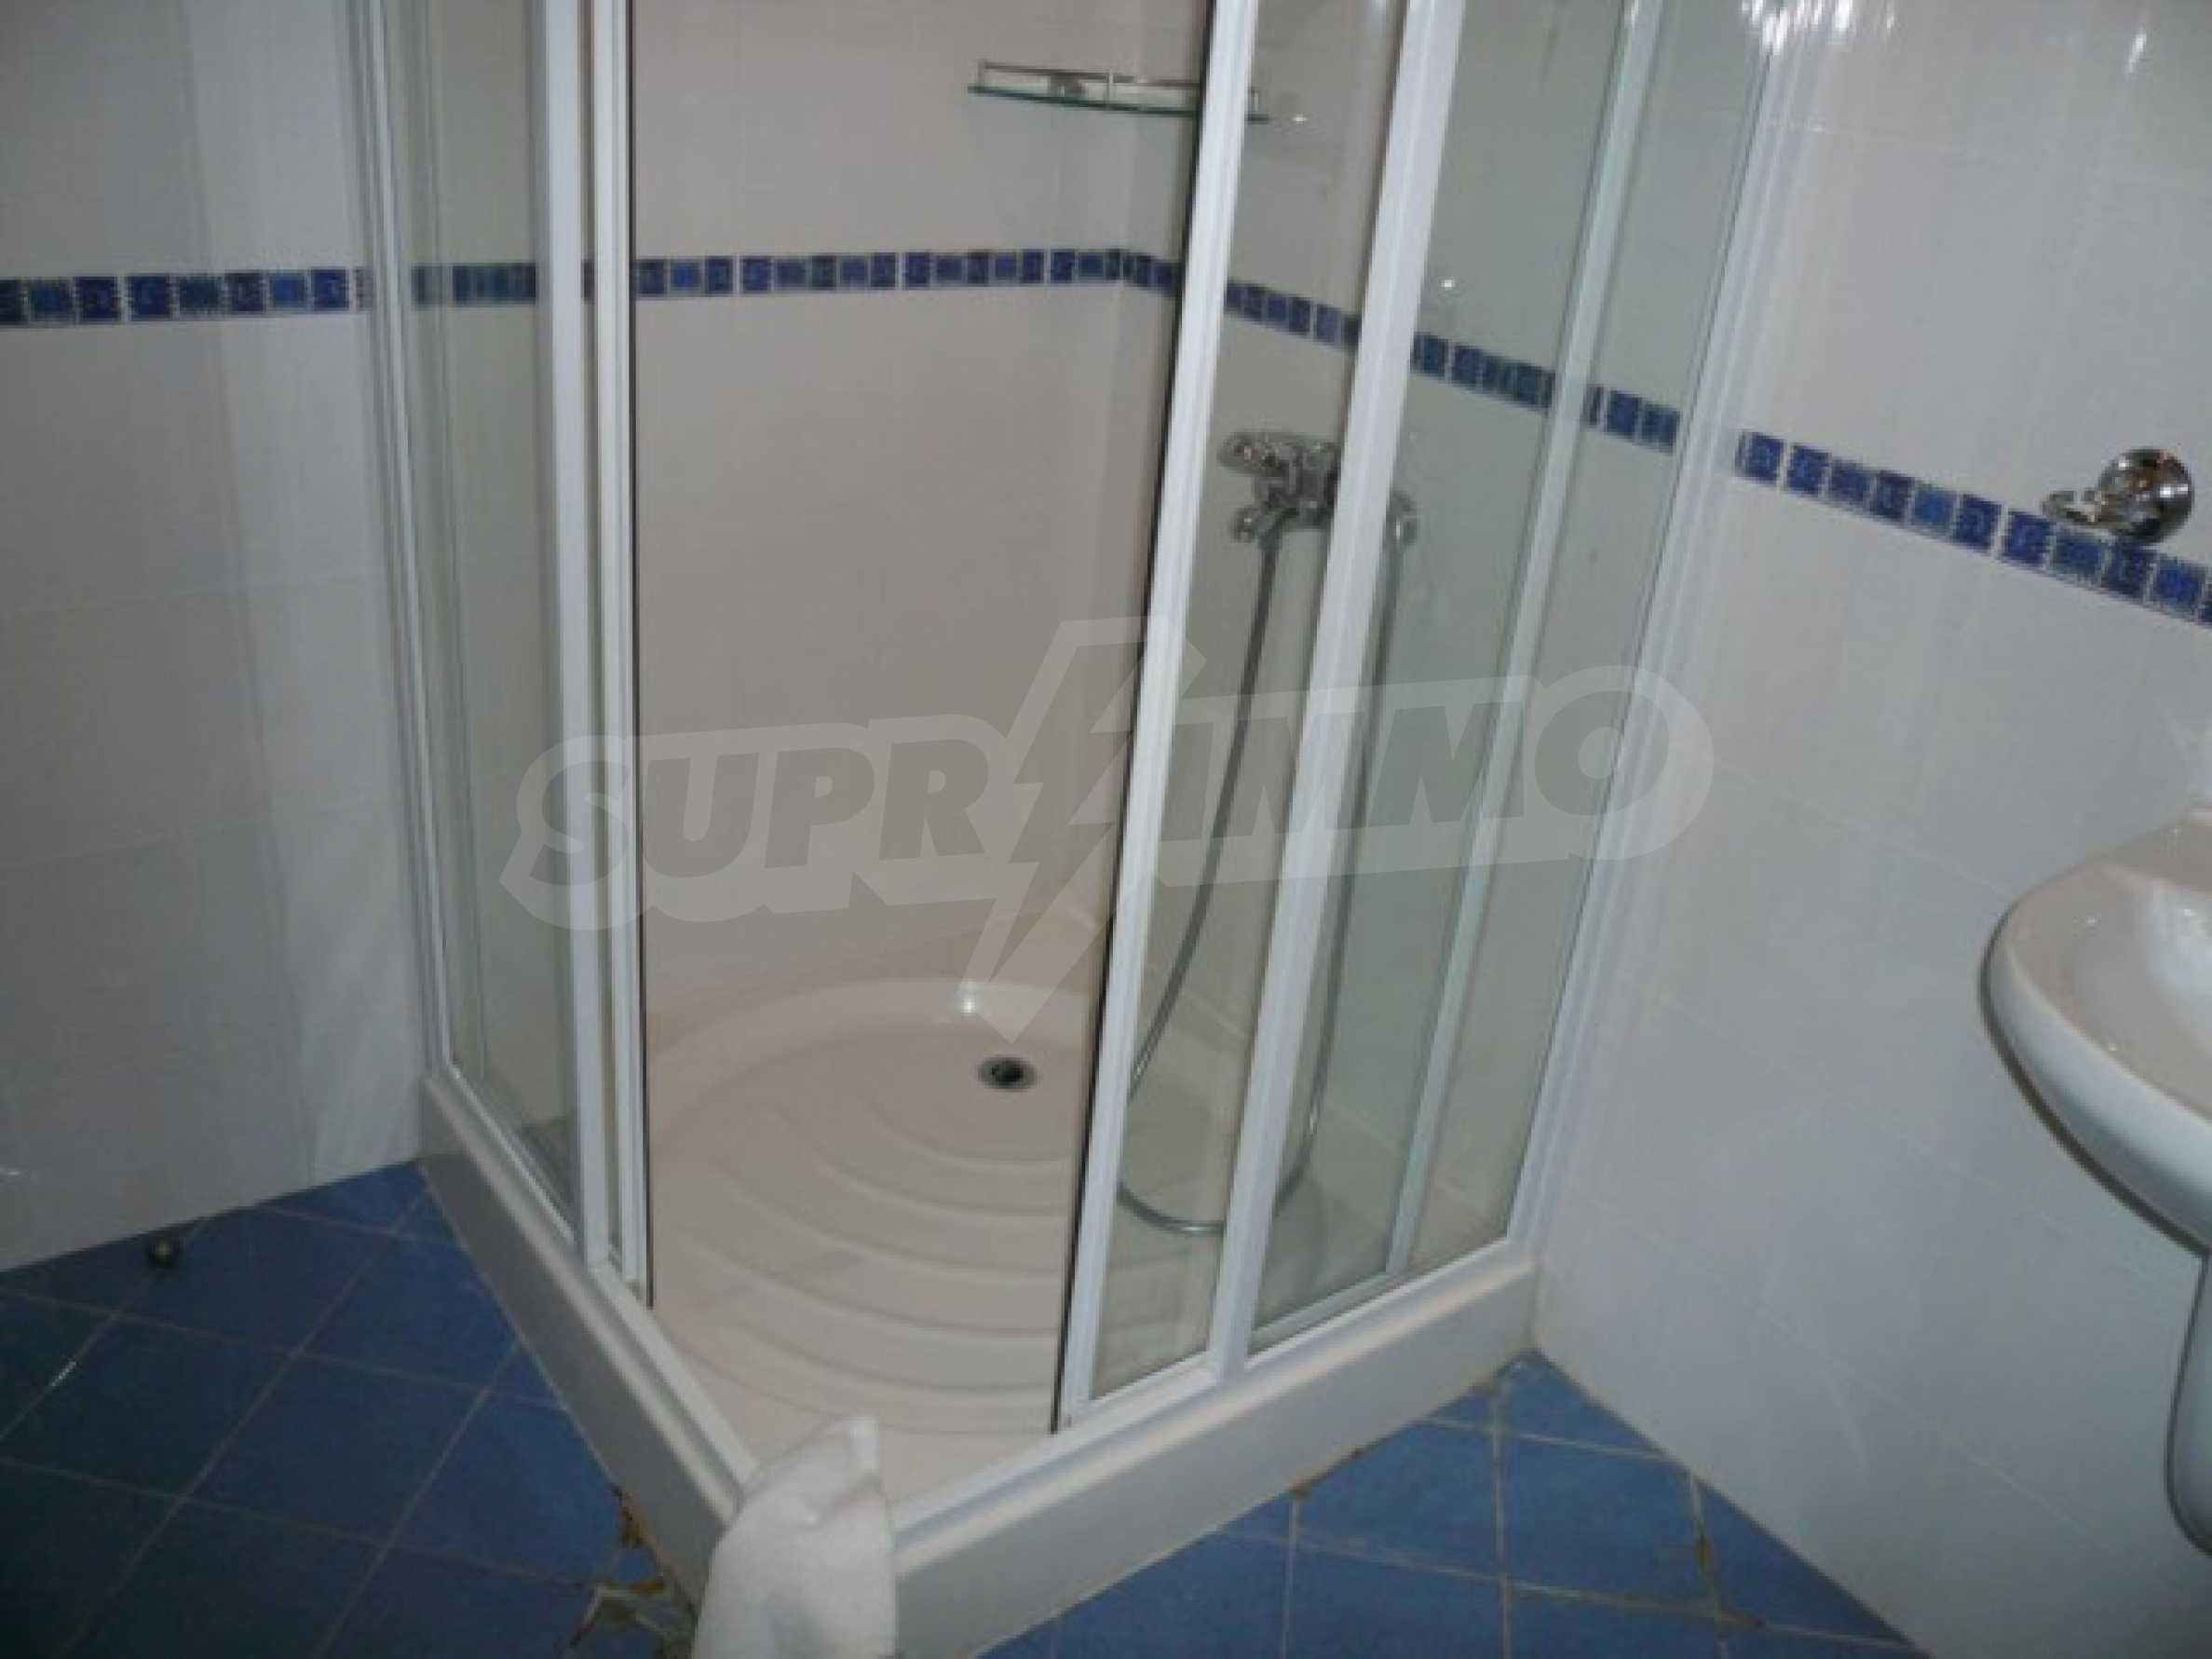 Двустаен апартамент за продажба в гр. Банско 7